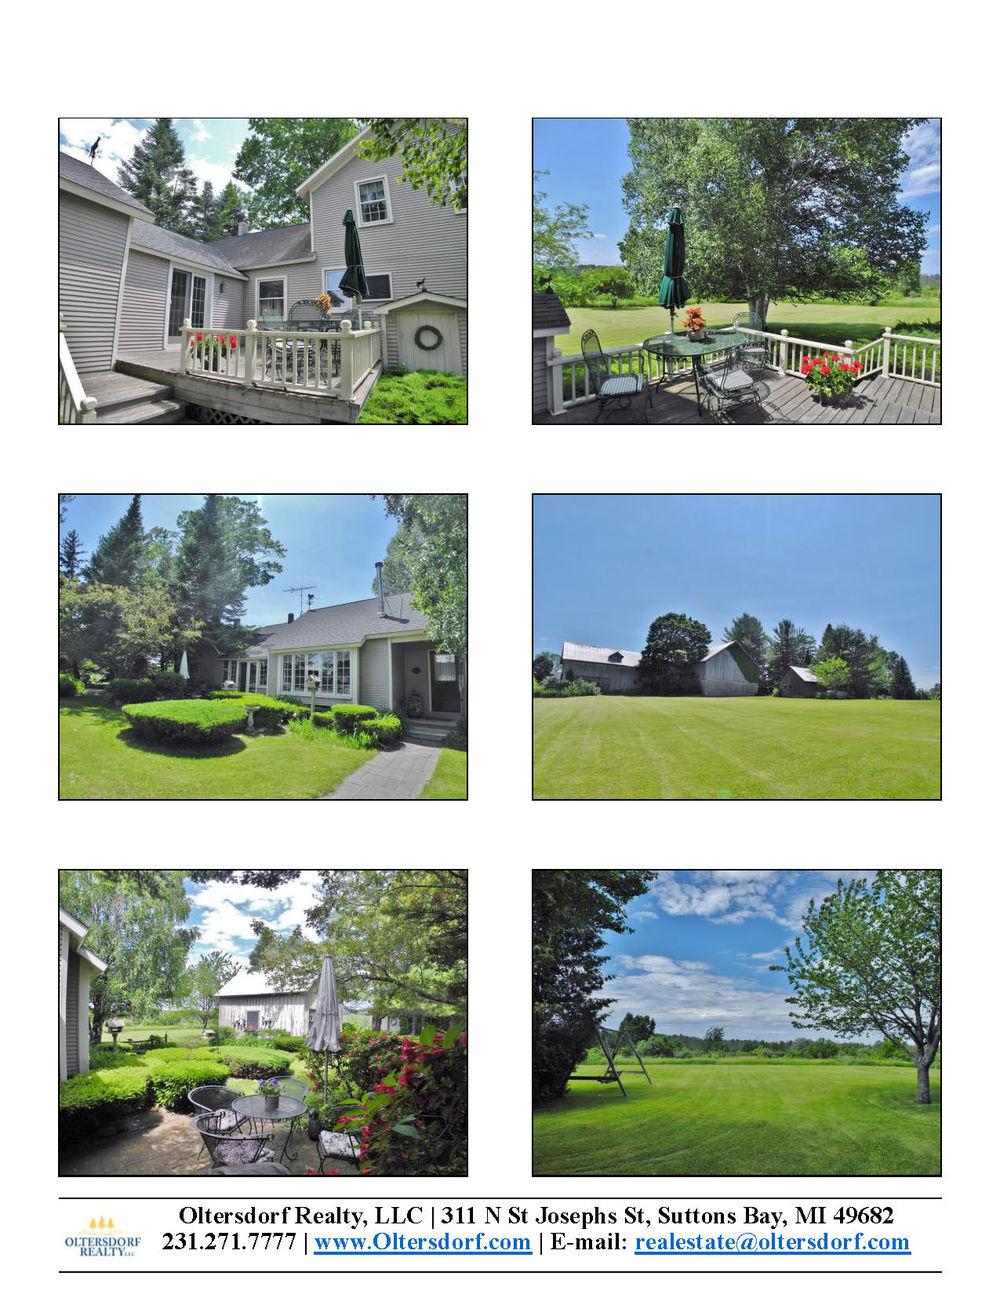 7251 E Alpers Road, Lake Leelanau, MI – Historic 1865 Centennial Inn For Sale By Oltersdorf Realty LLC Information Packet (3).jpg